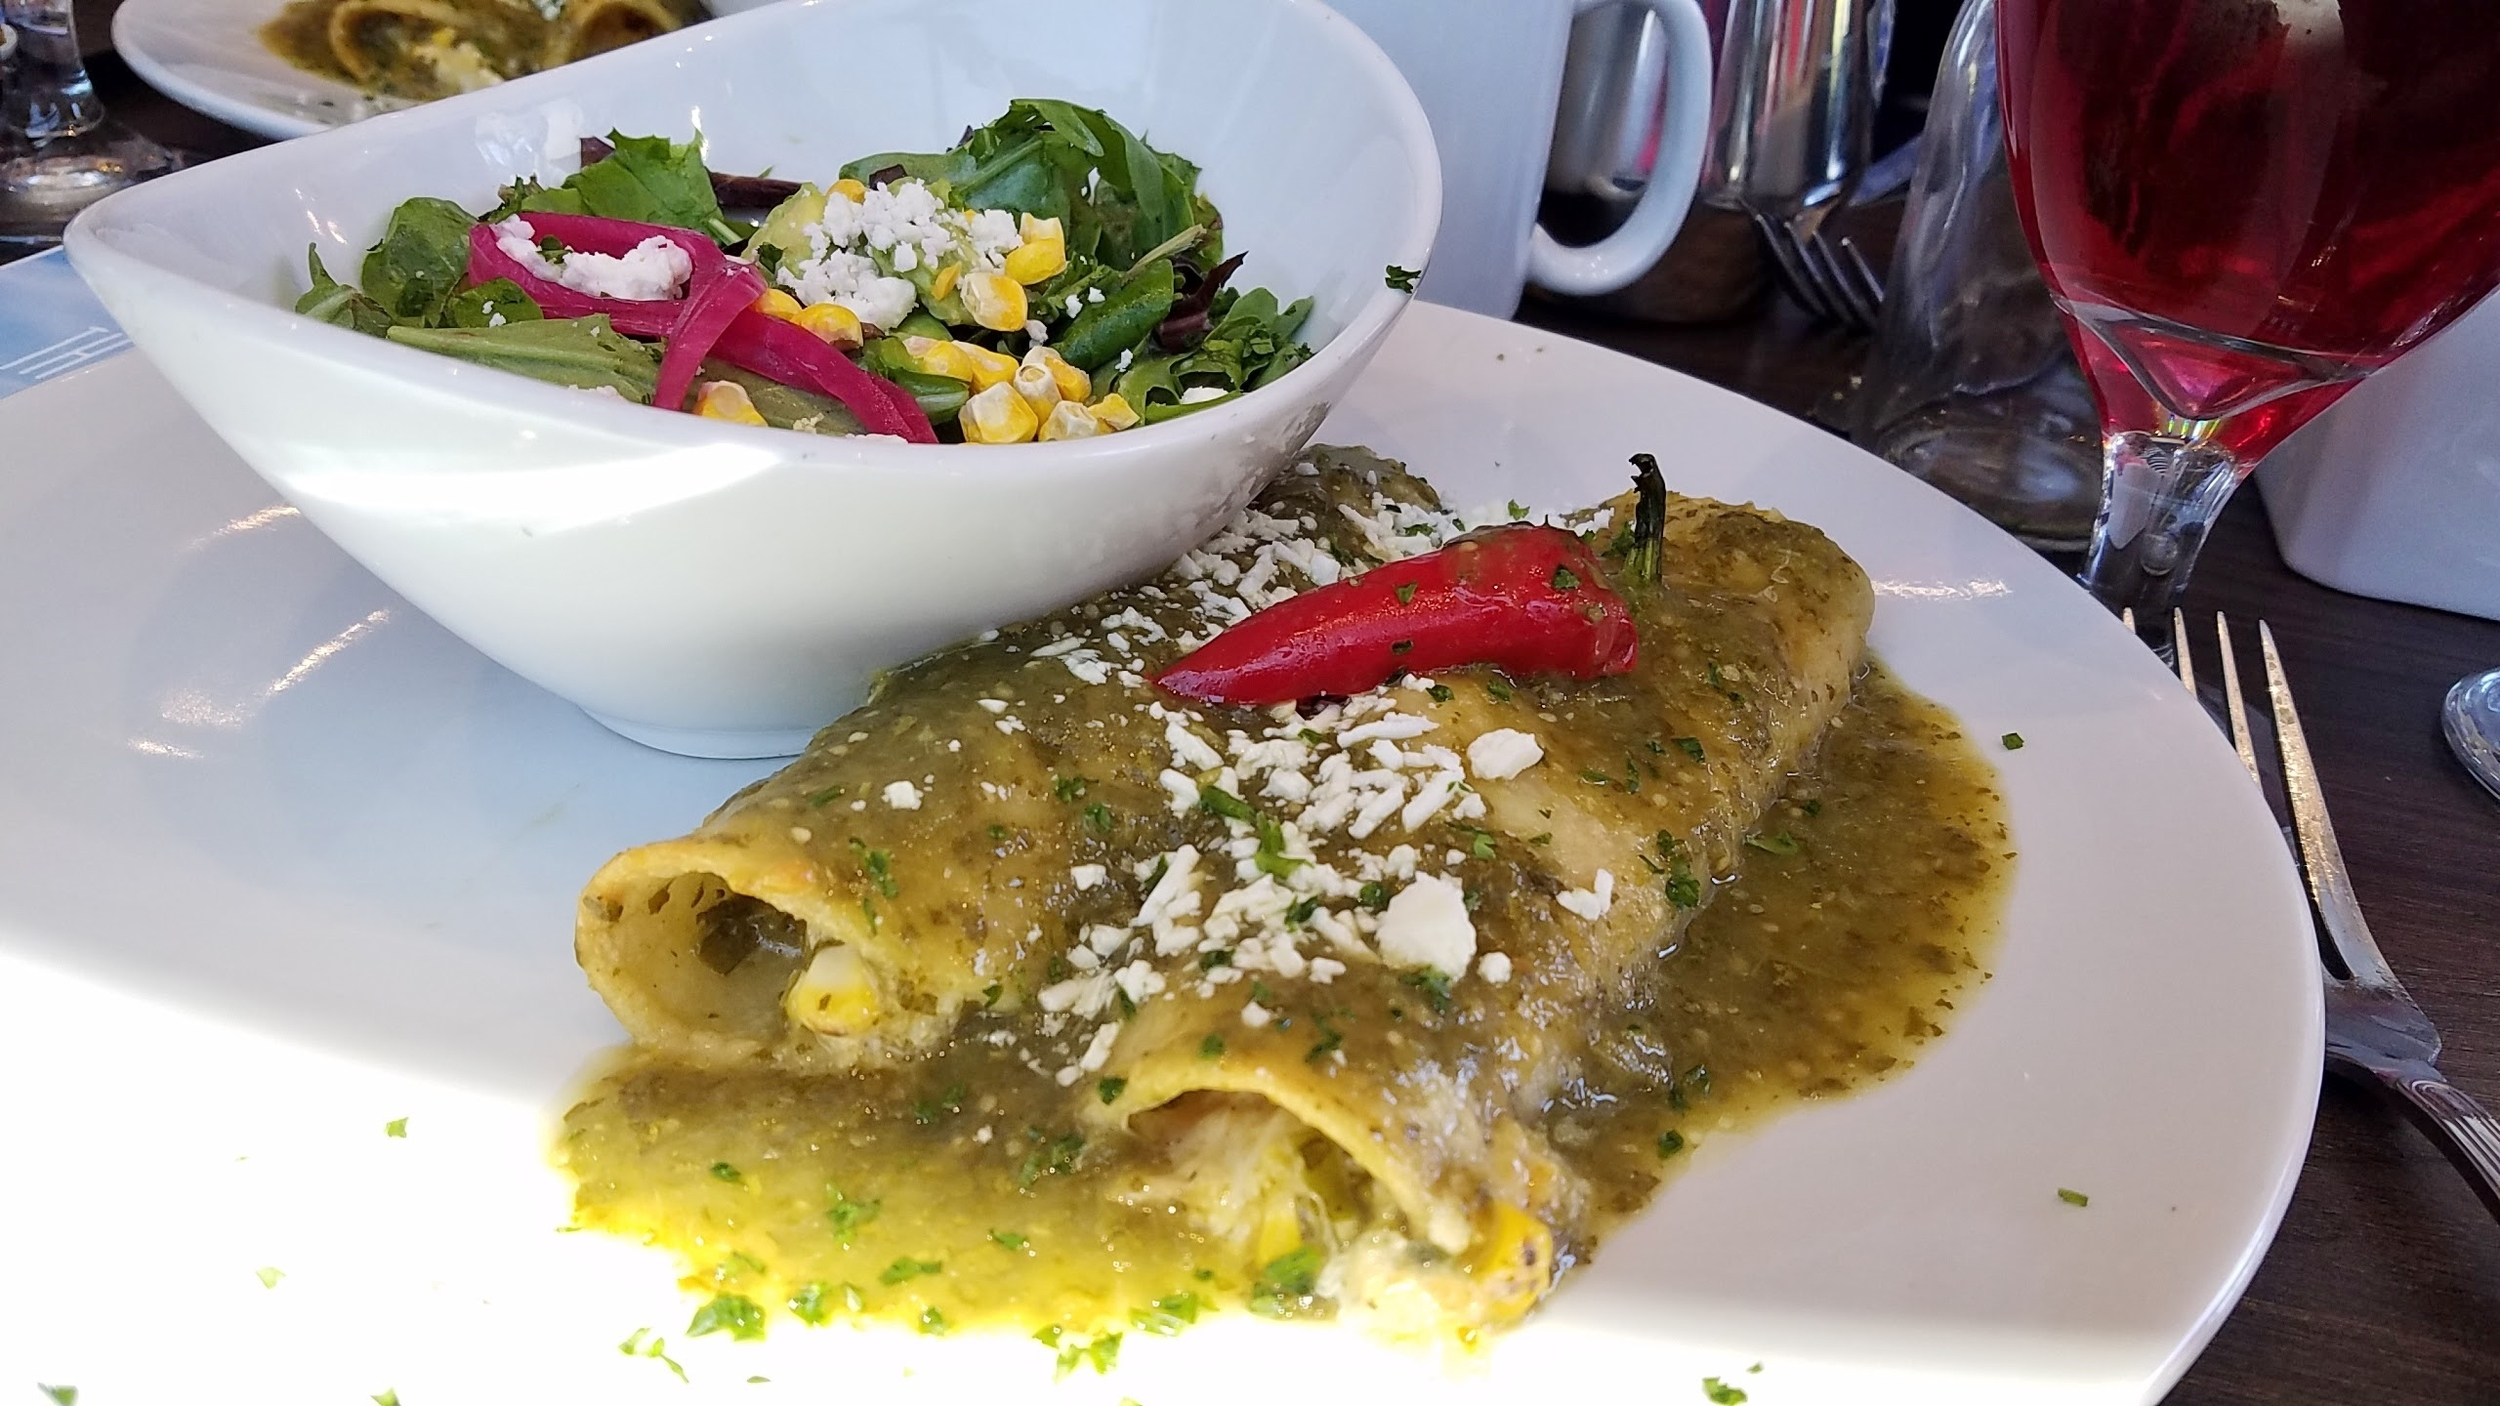 Butternut squash and corn enchiladas